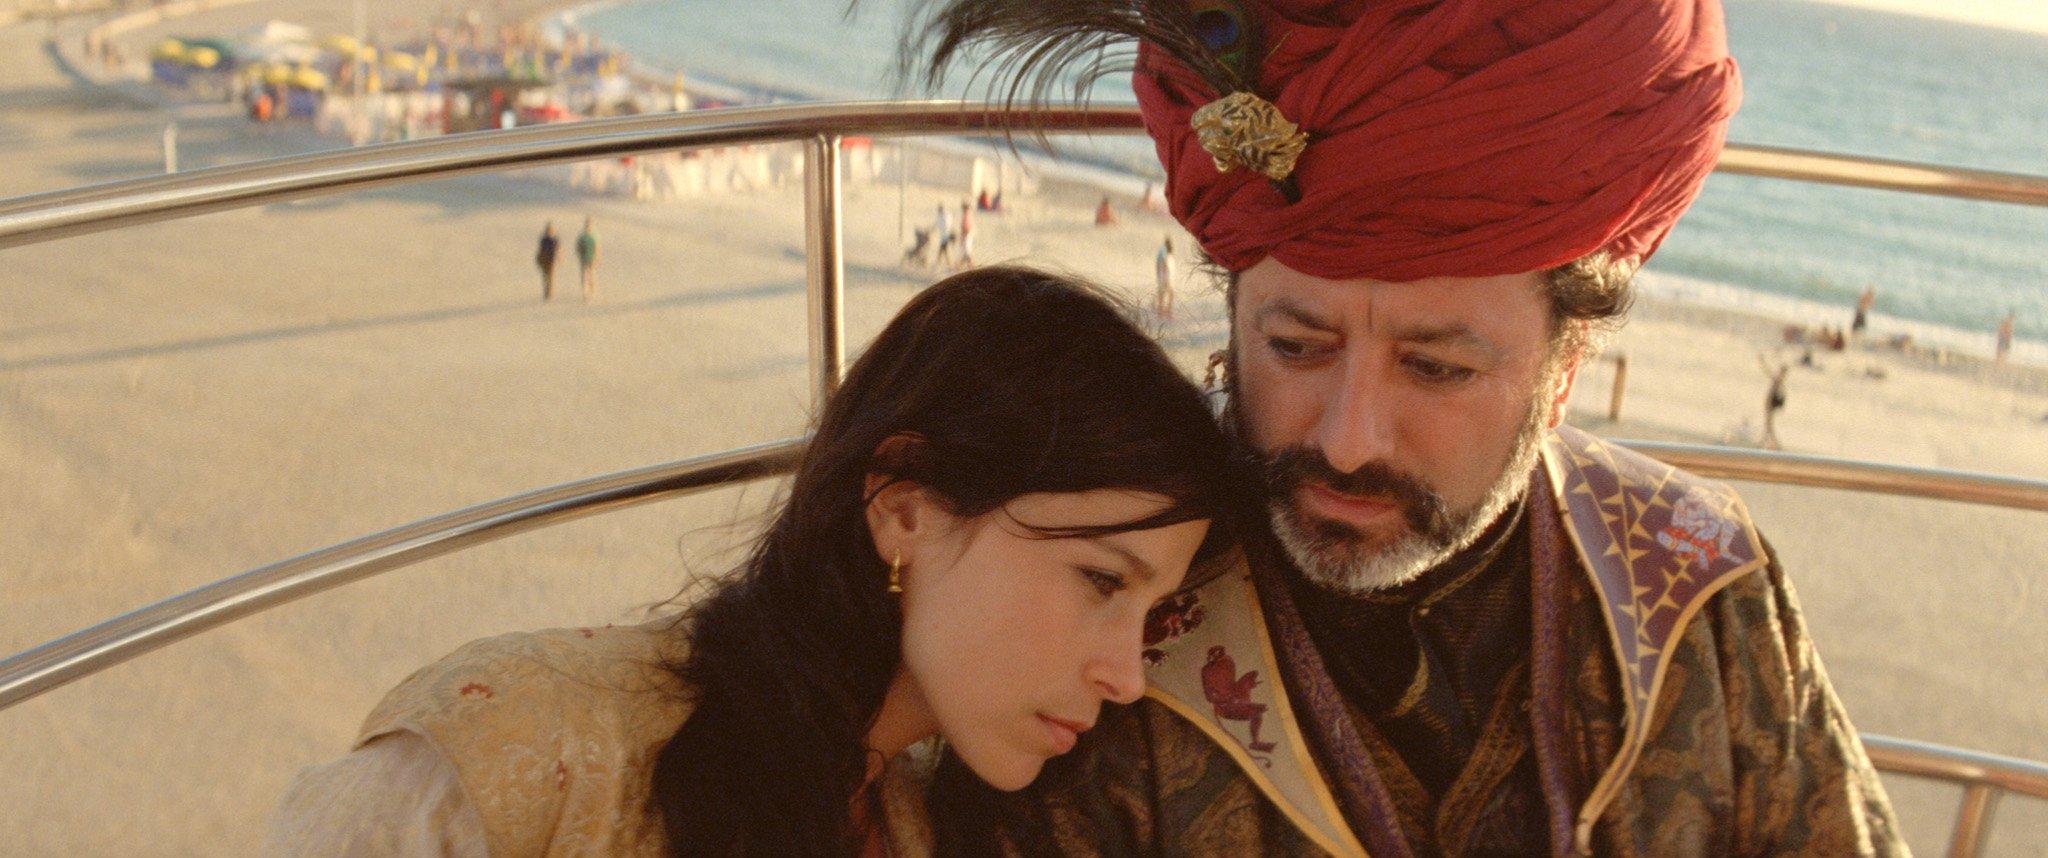 Arabian Nights: Volume 3, The Enchanted One